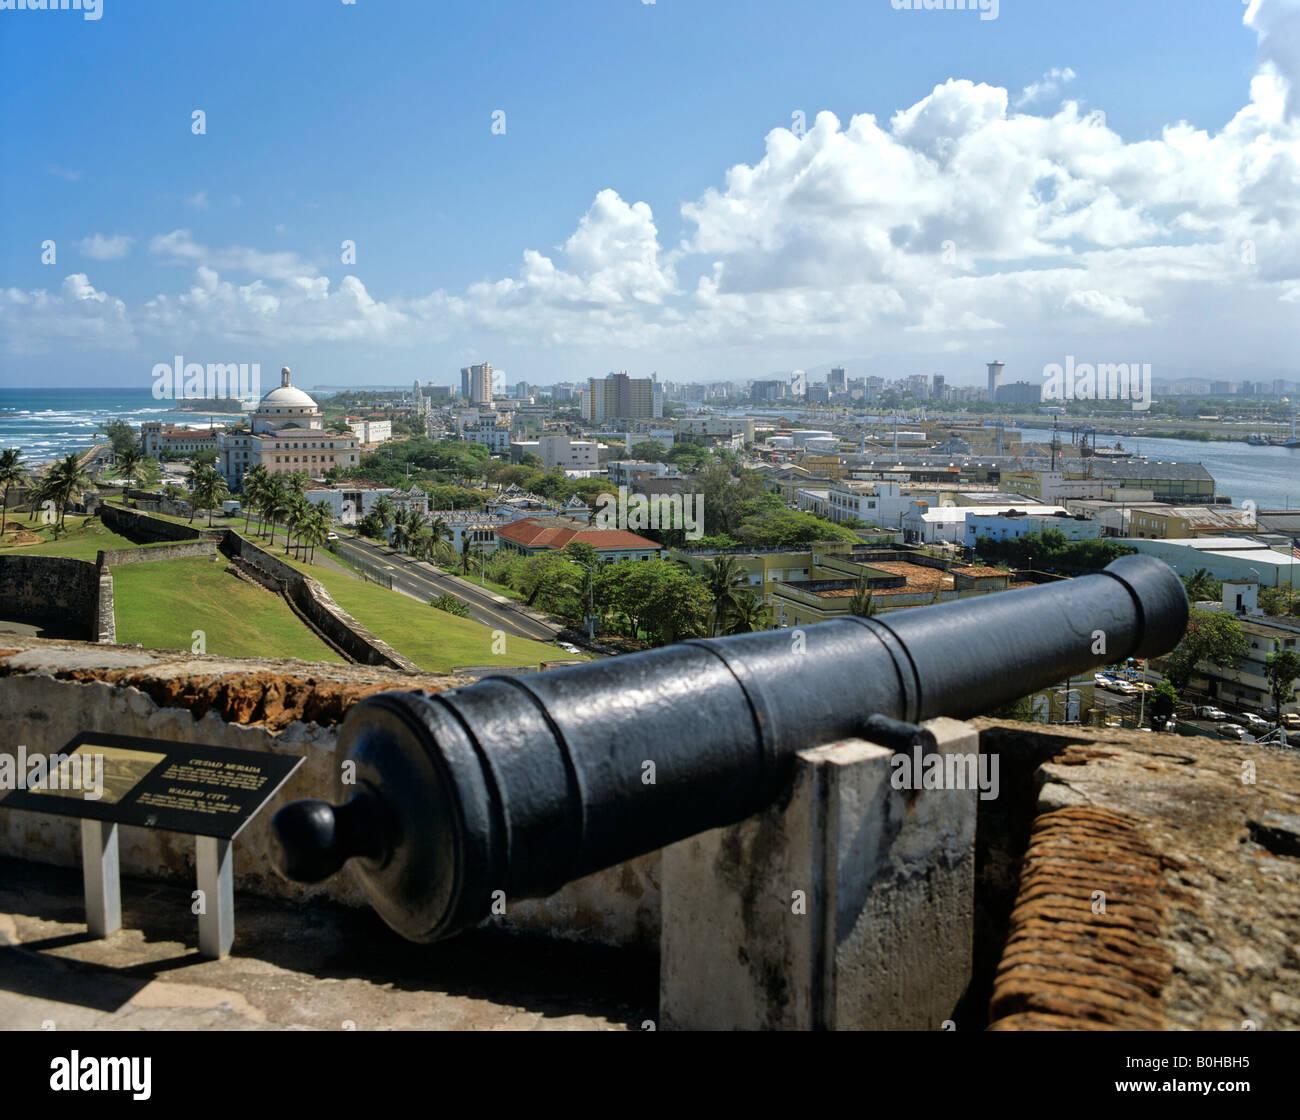 El Castillo San Felipe del Morro, Festung, Cannon, UNESCO-Weltkulturerbe, San Juan, Puerto Rico, Karibik Stockbild